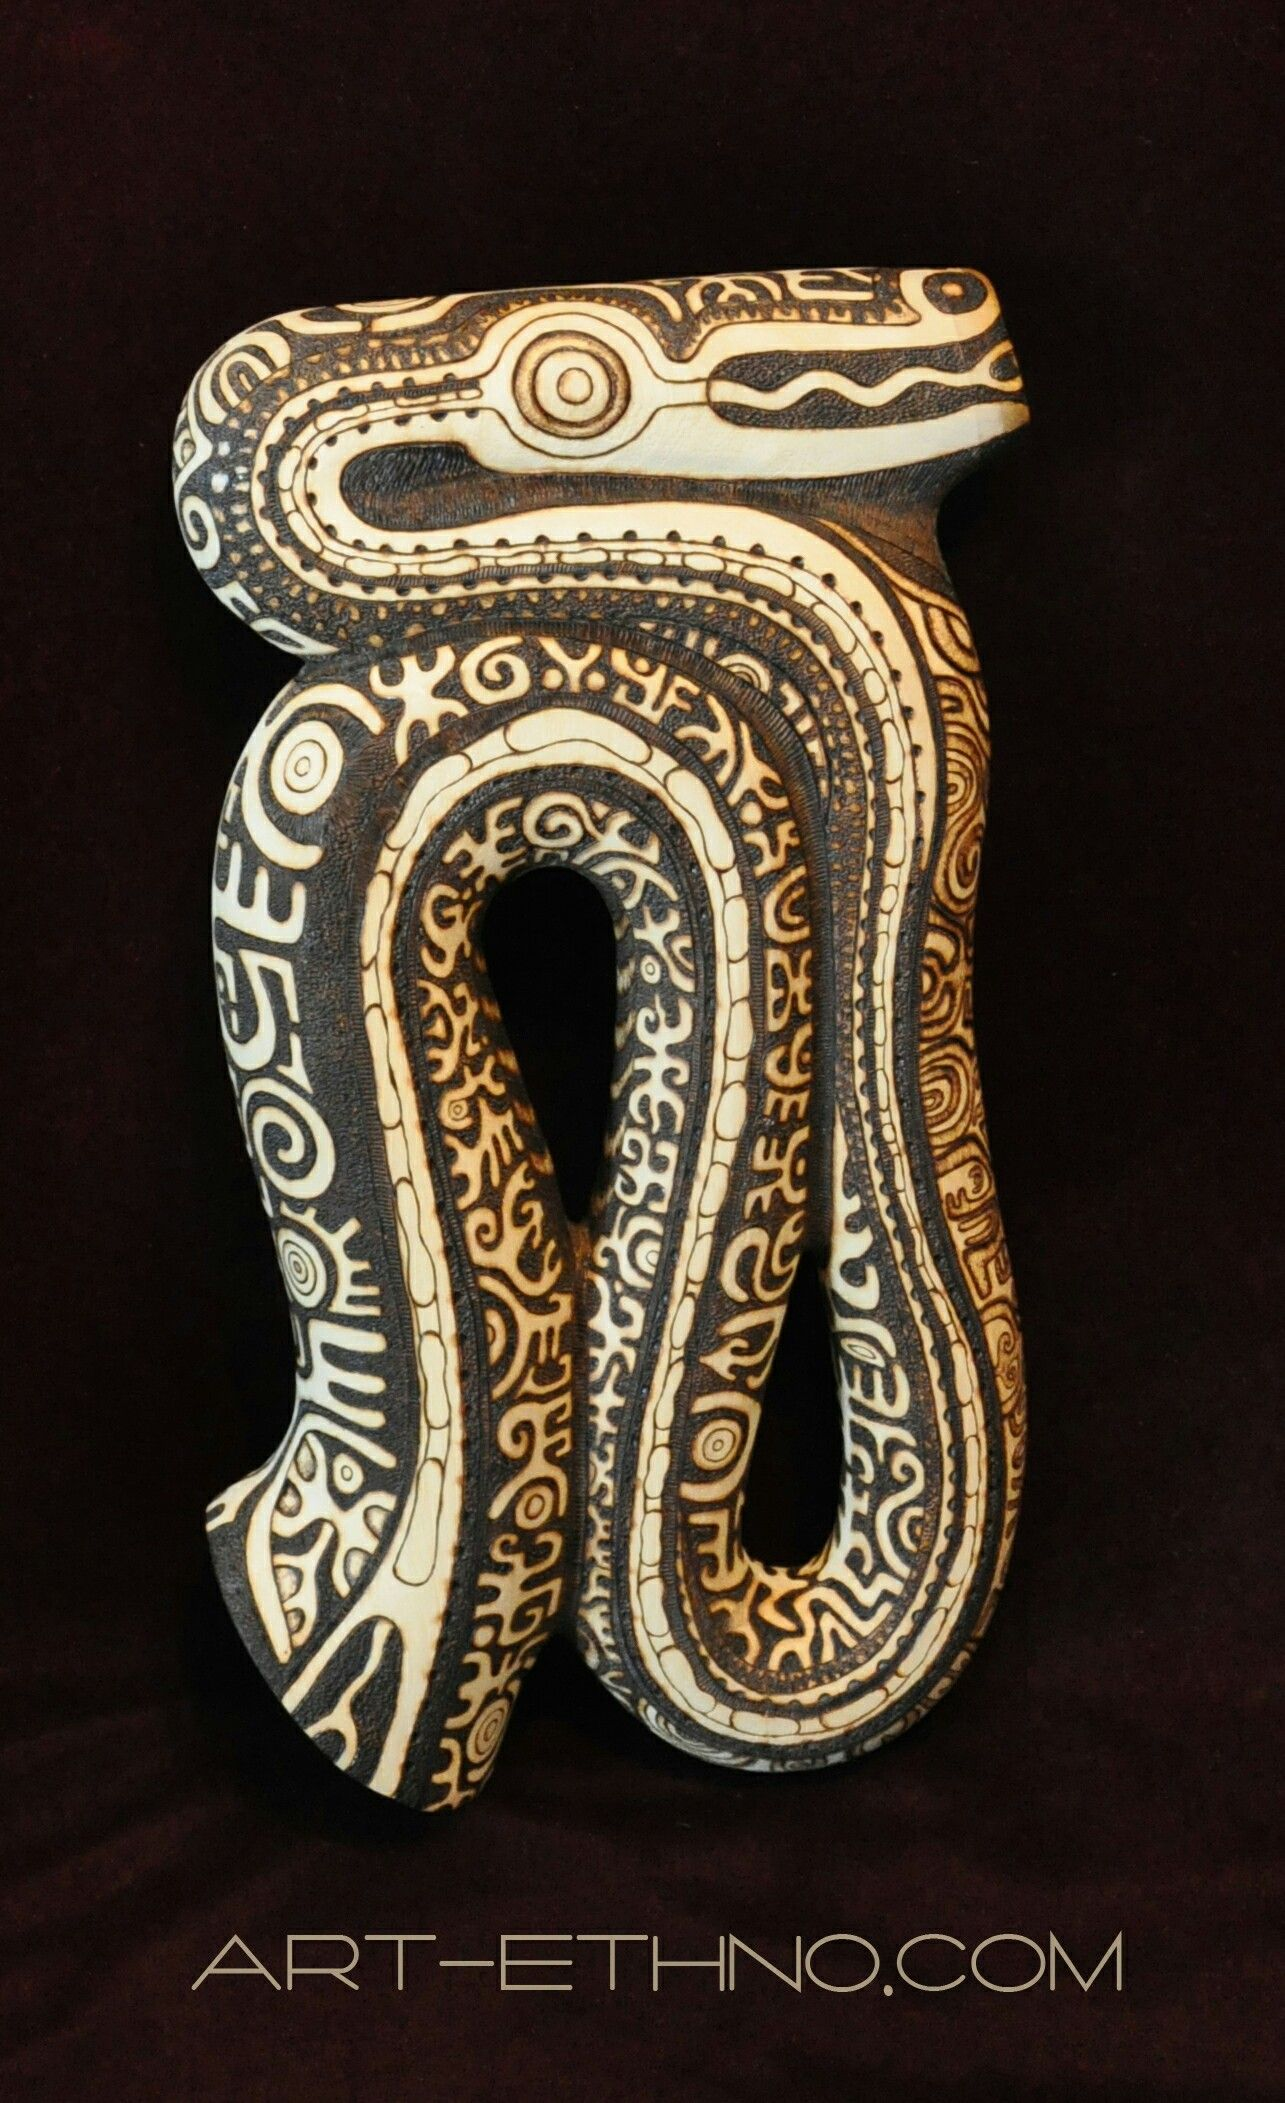 Pin by ABDUL HAFEEZ on Pyrography Pyrography, Didgeridoo